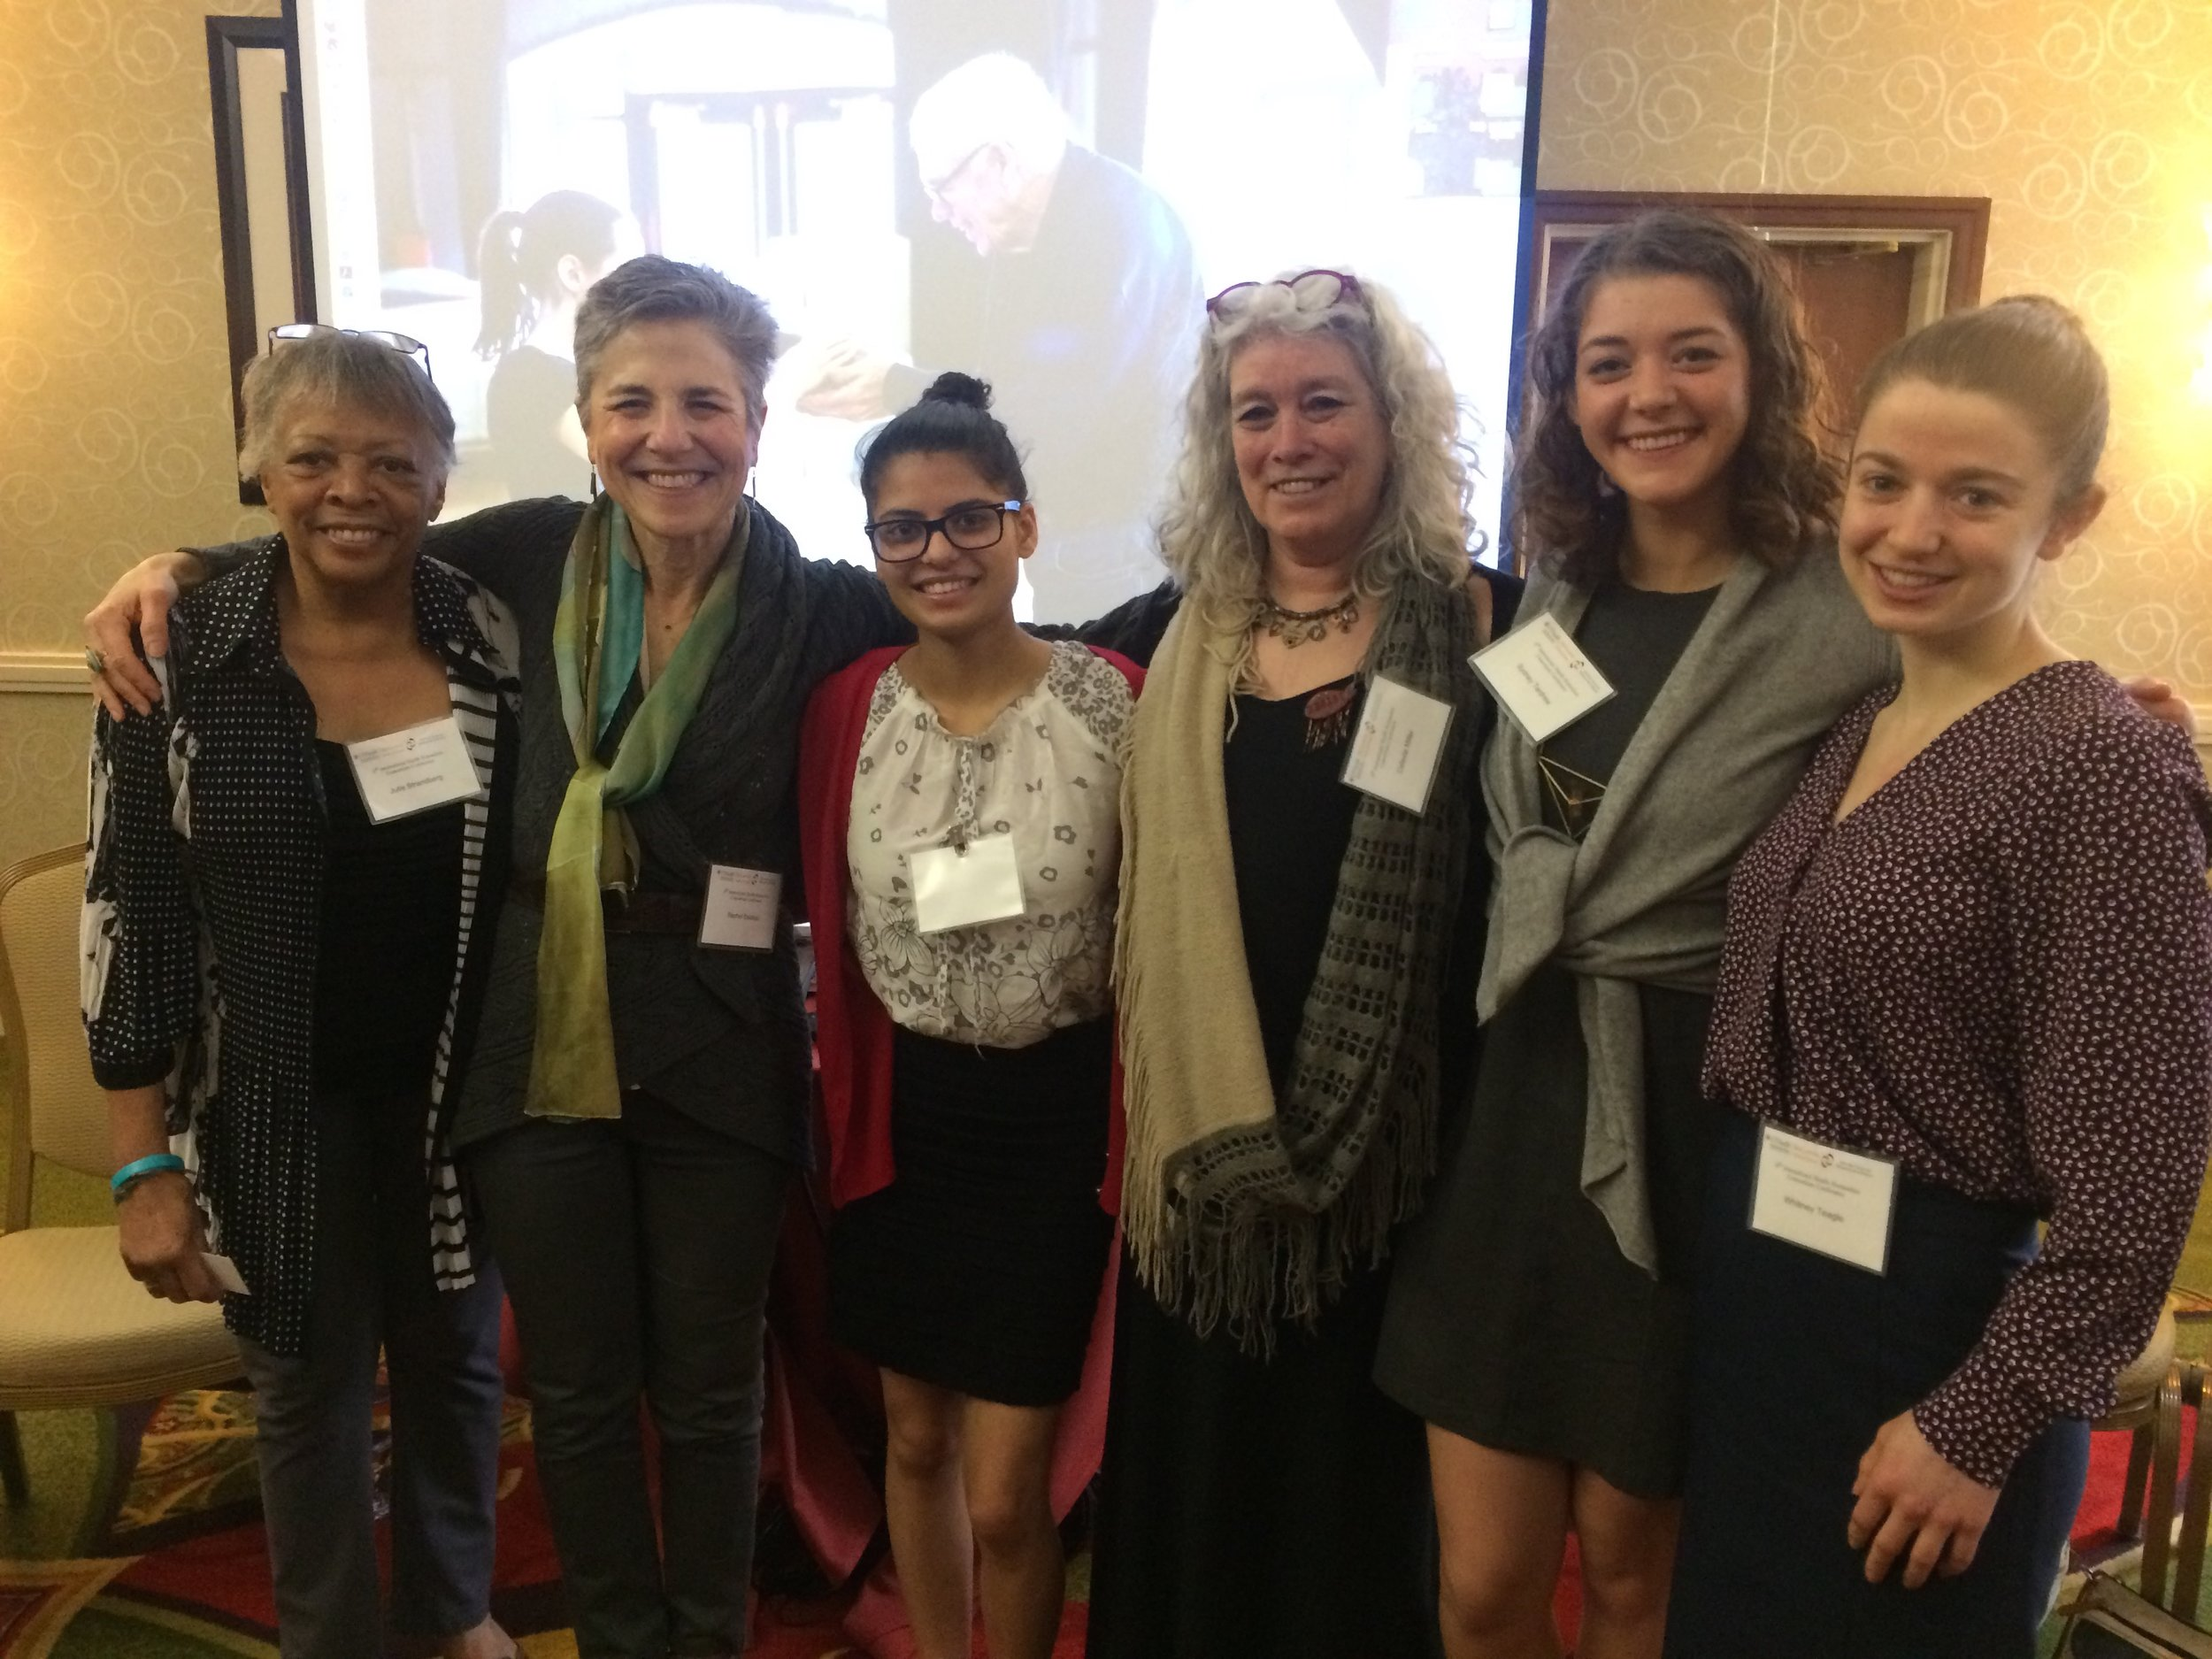 Julie Strandberg, Rachel Balaban, Krishna Mudwari, Celeste Miller, Sydney Tardrew, and Whitney Teagle.